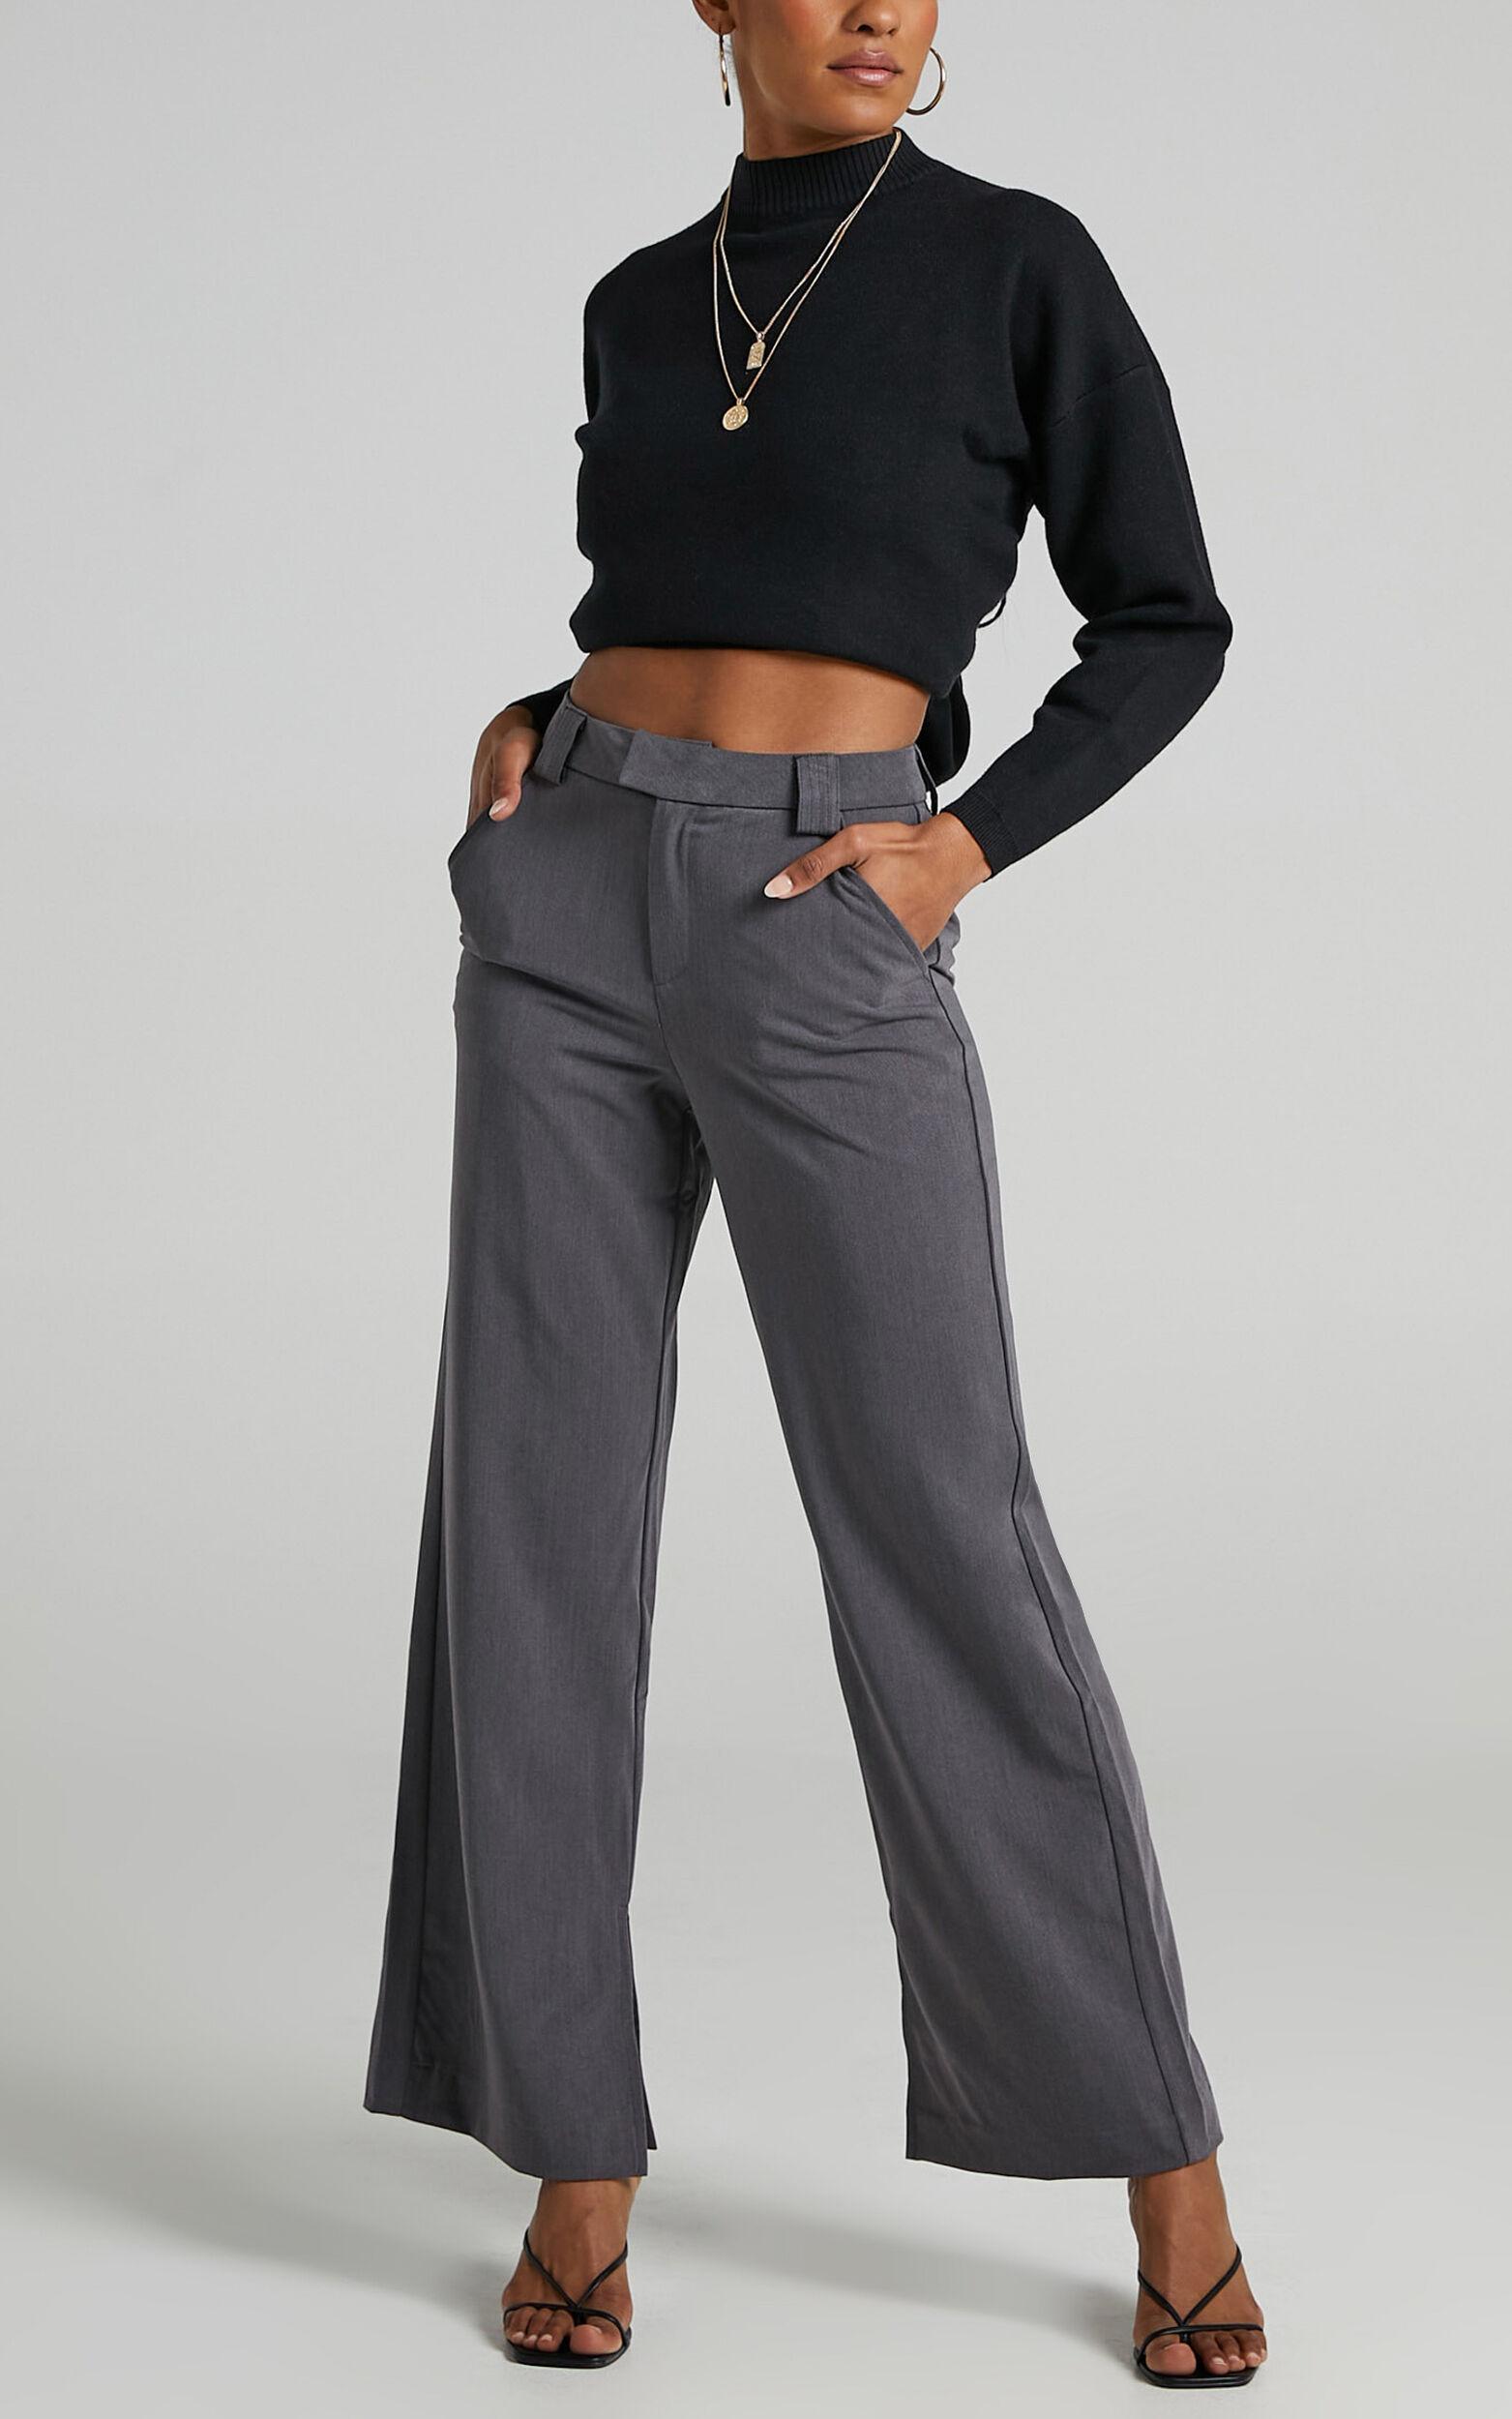 Sabra Pants in Charcoal Grey - 04, GRY1, super-hi-res image number null